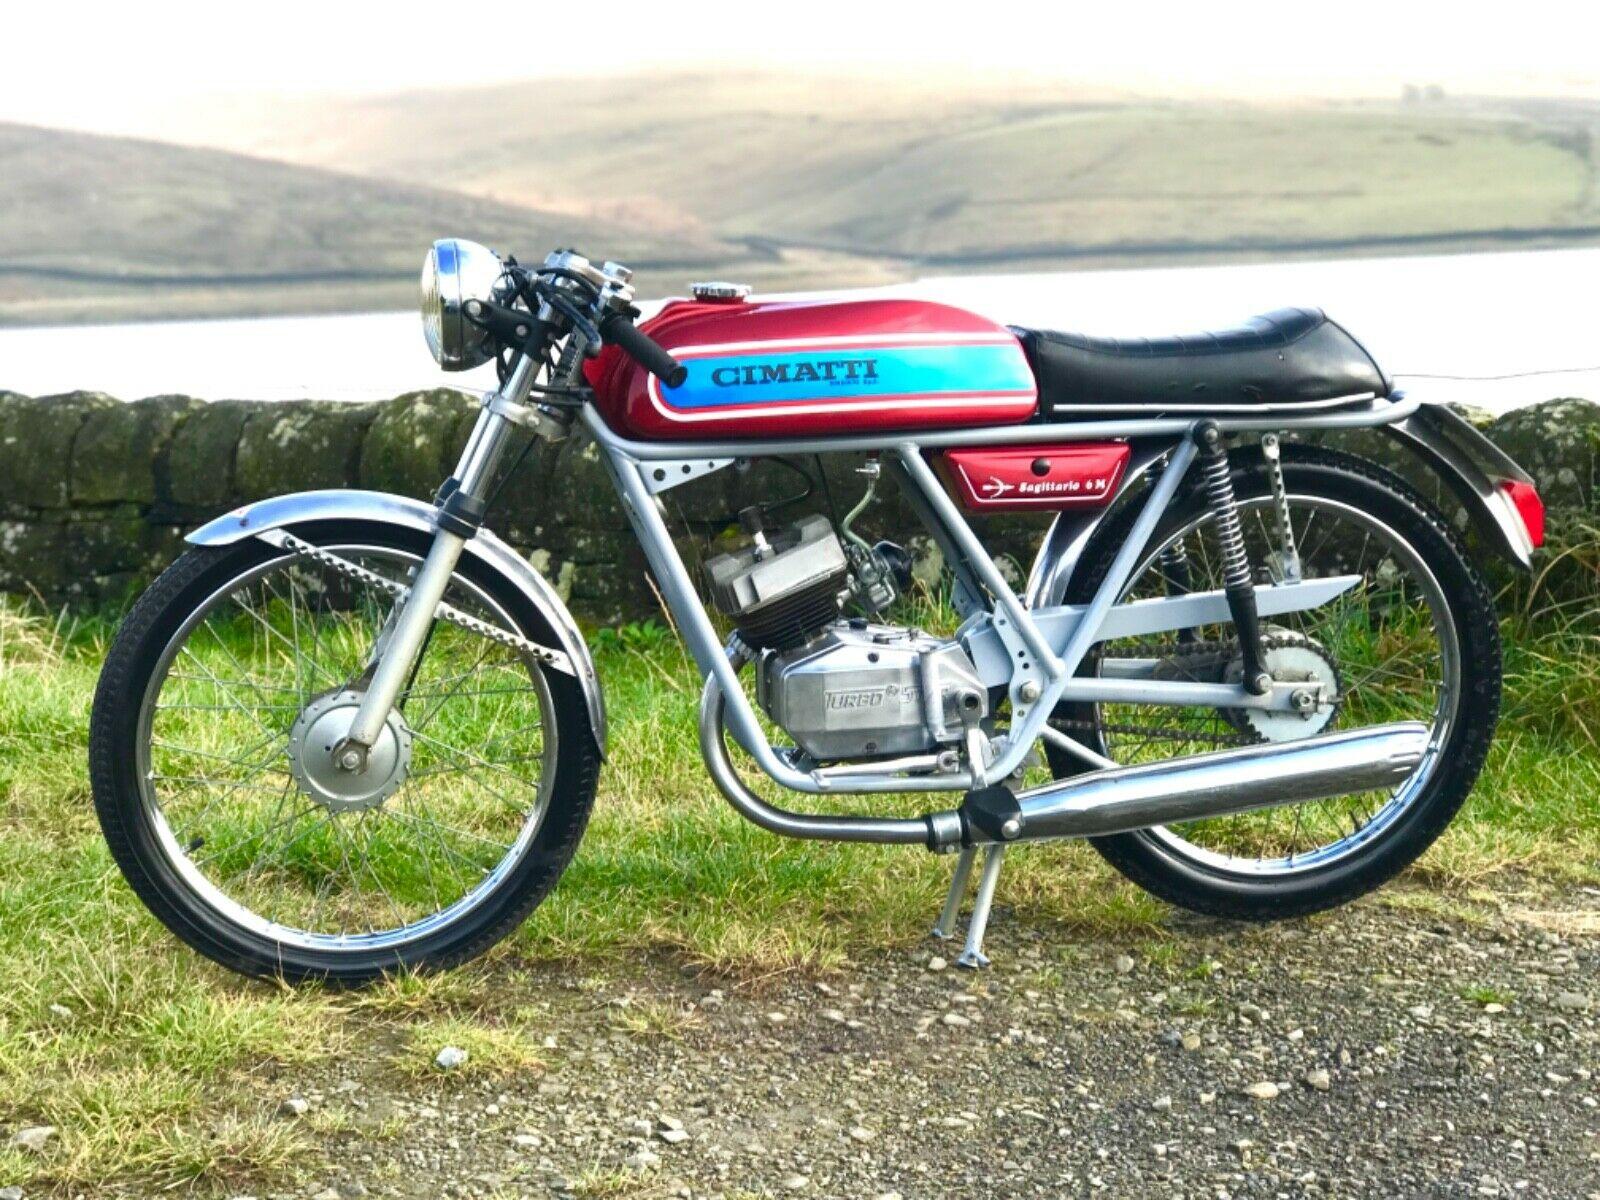 CIMATTI SAGITTARIO 6M 50cc Pedal Start 1973